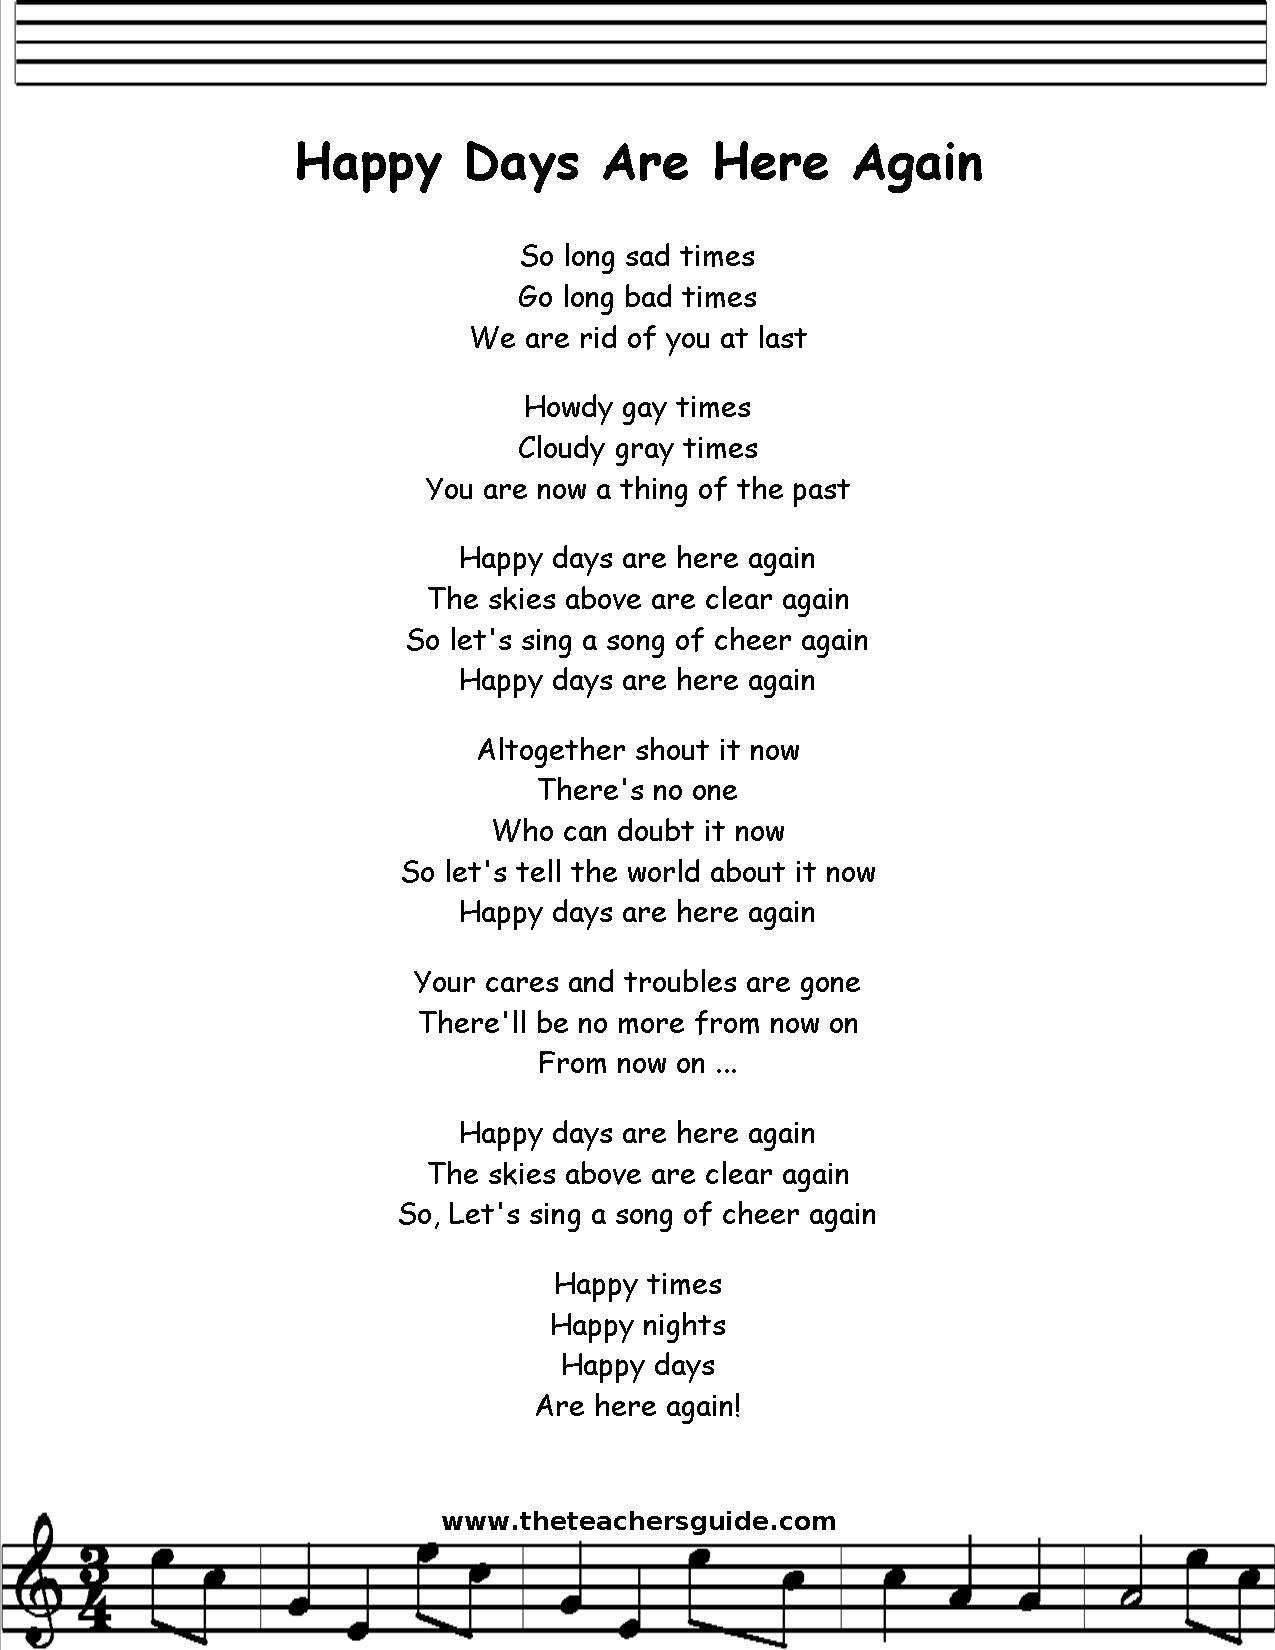 PHARRELL WILLIAMS - HAPPY LYRICS